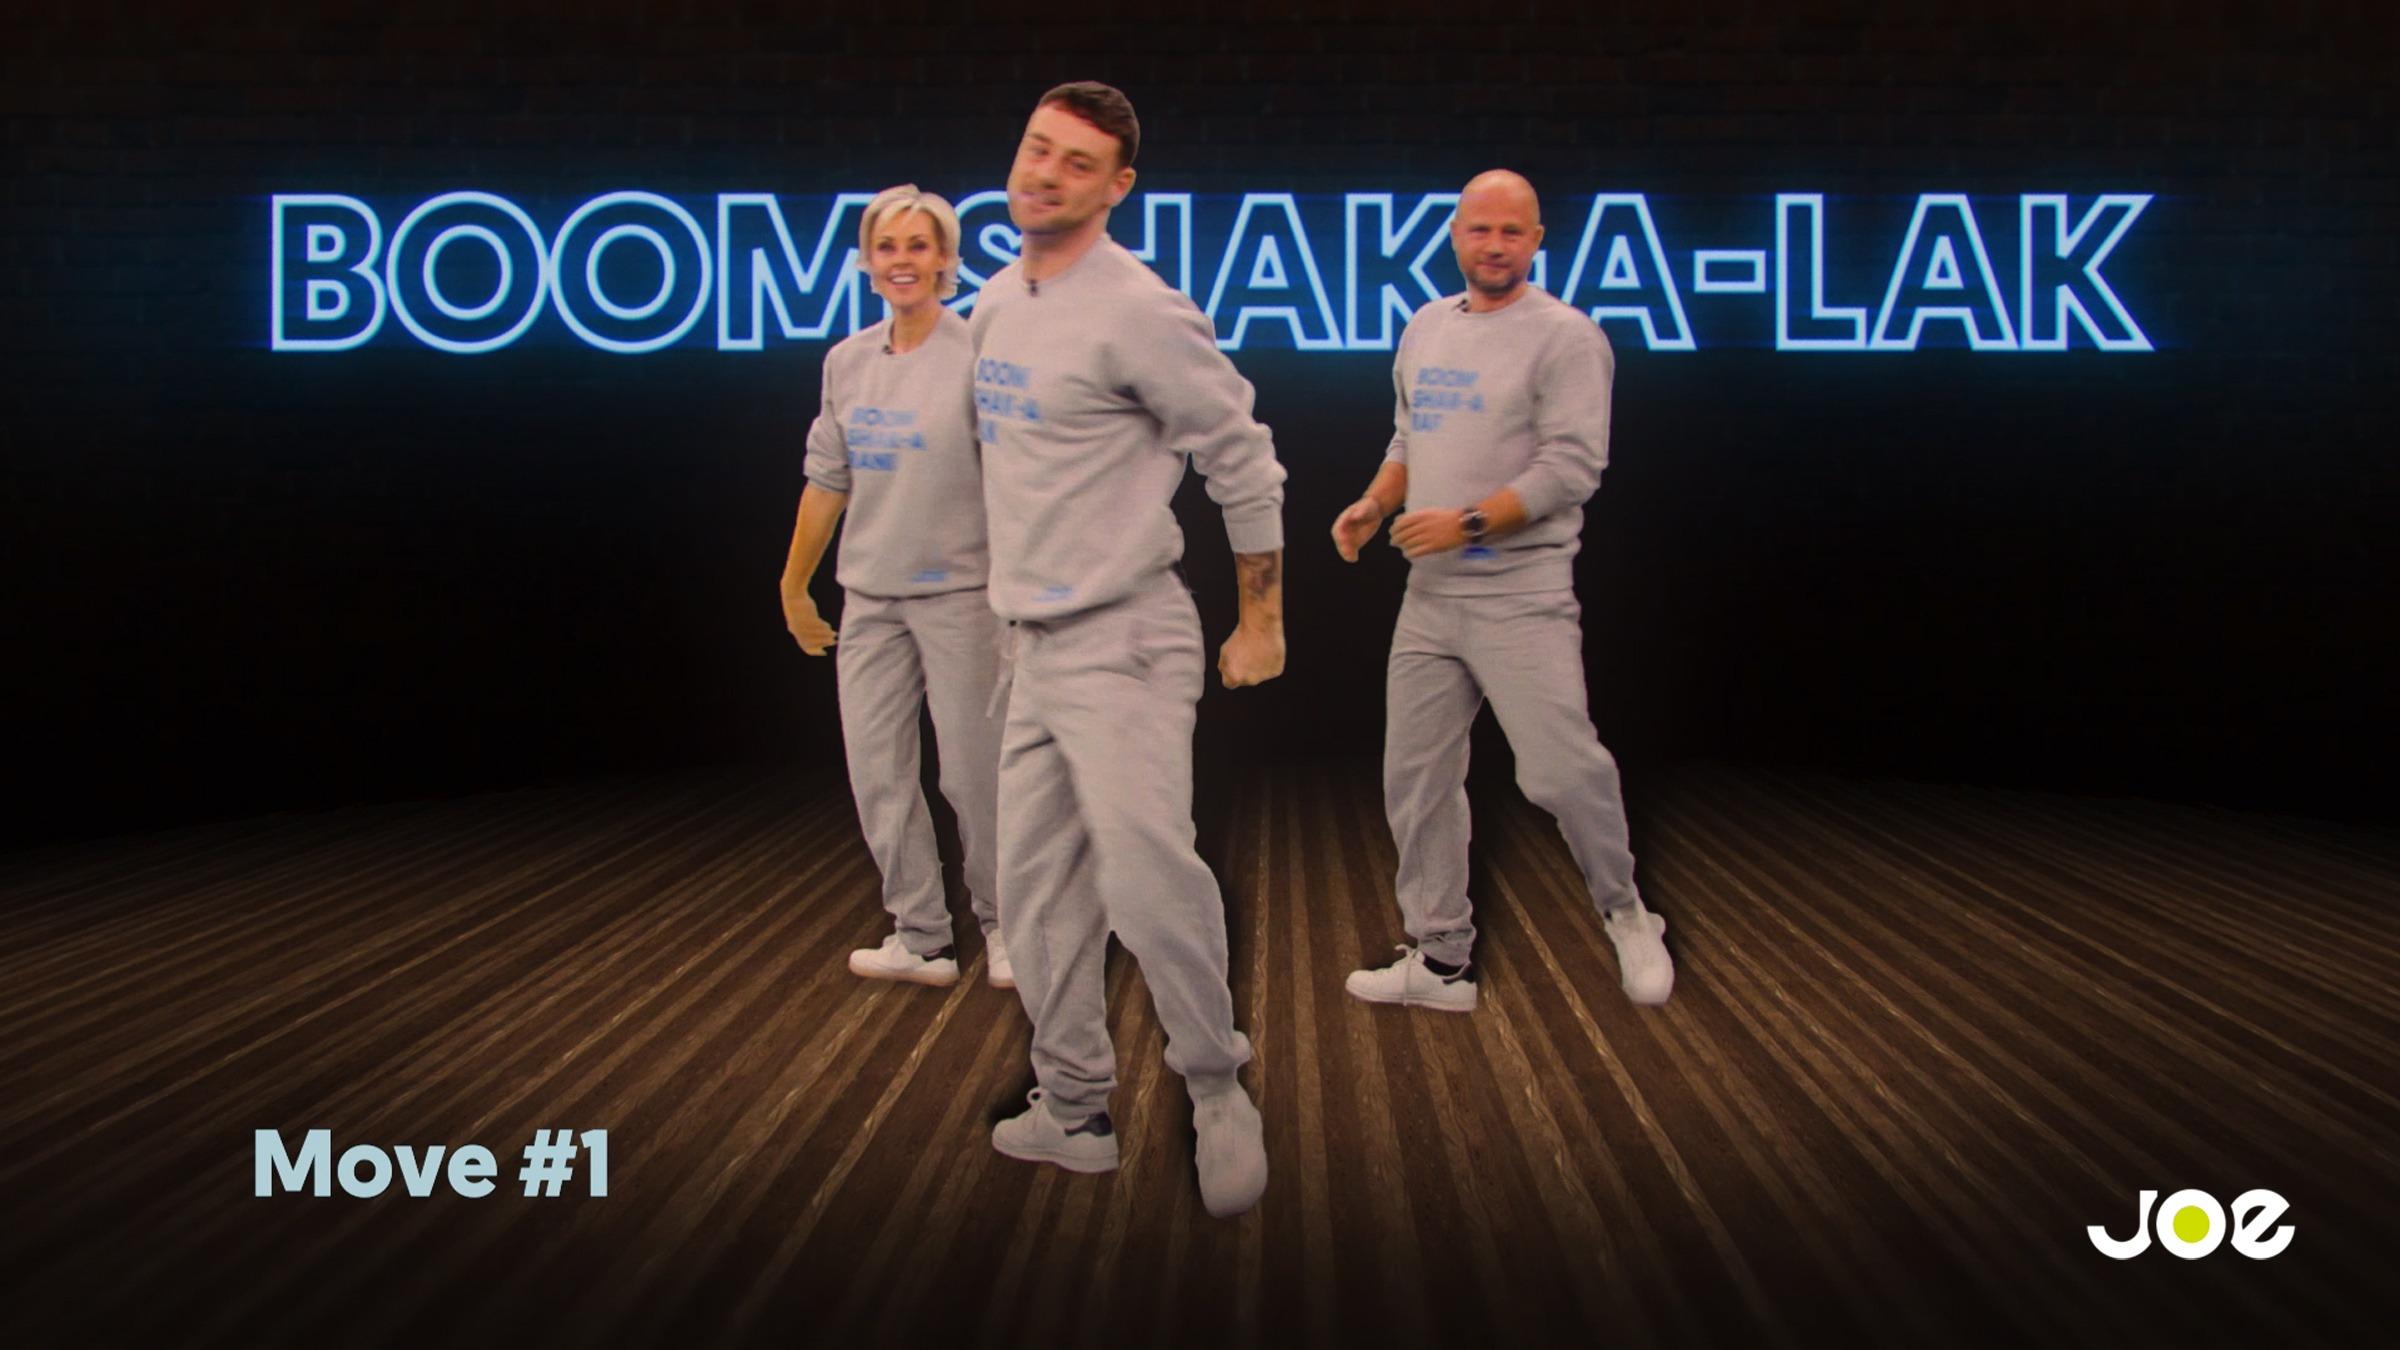 Boomshak 1